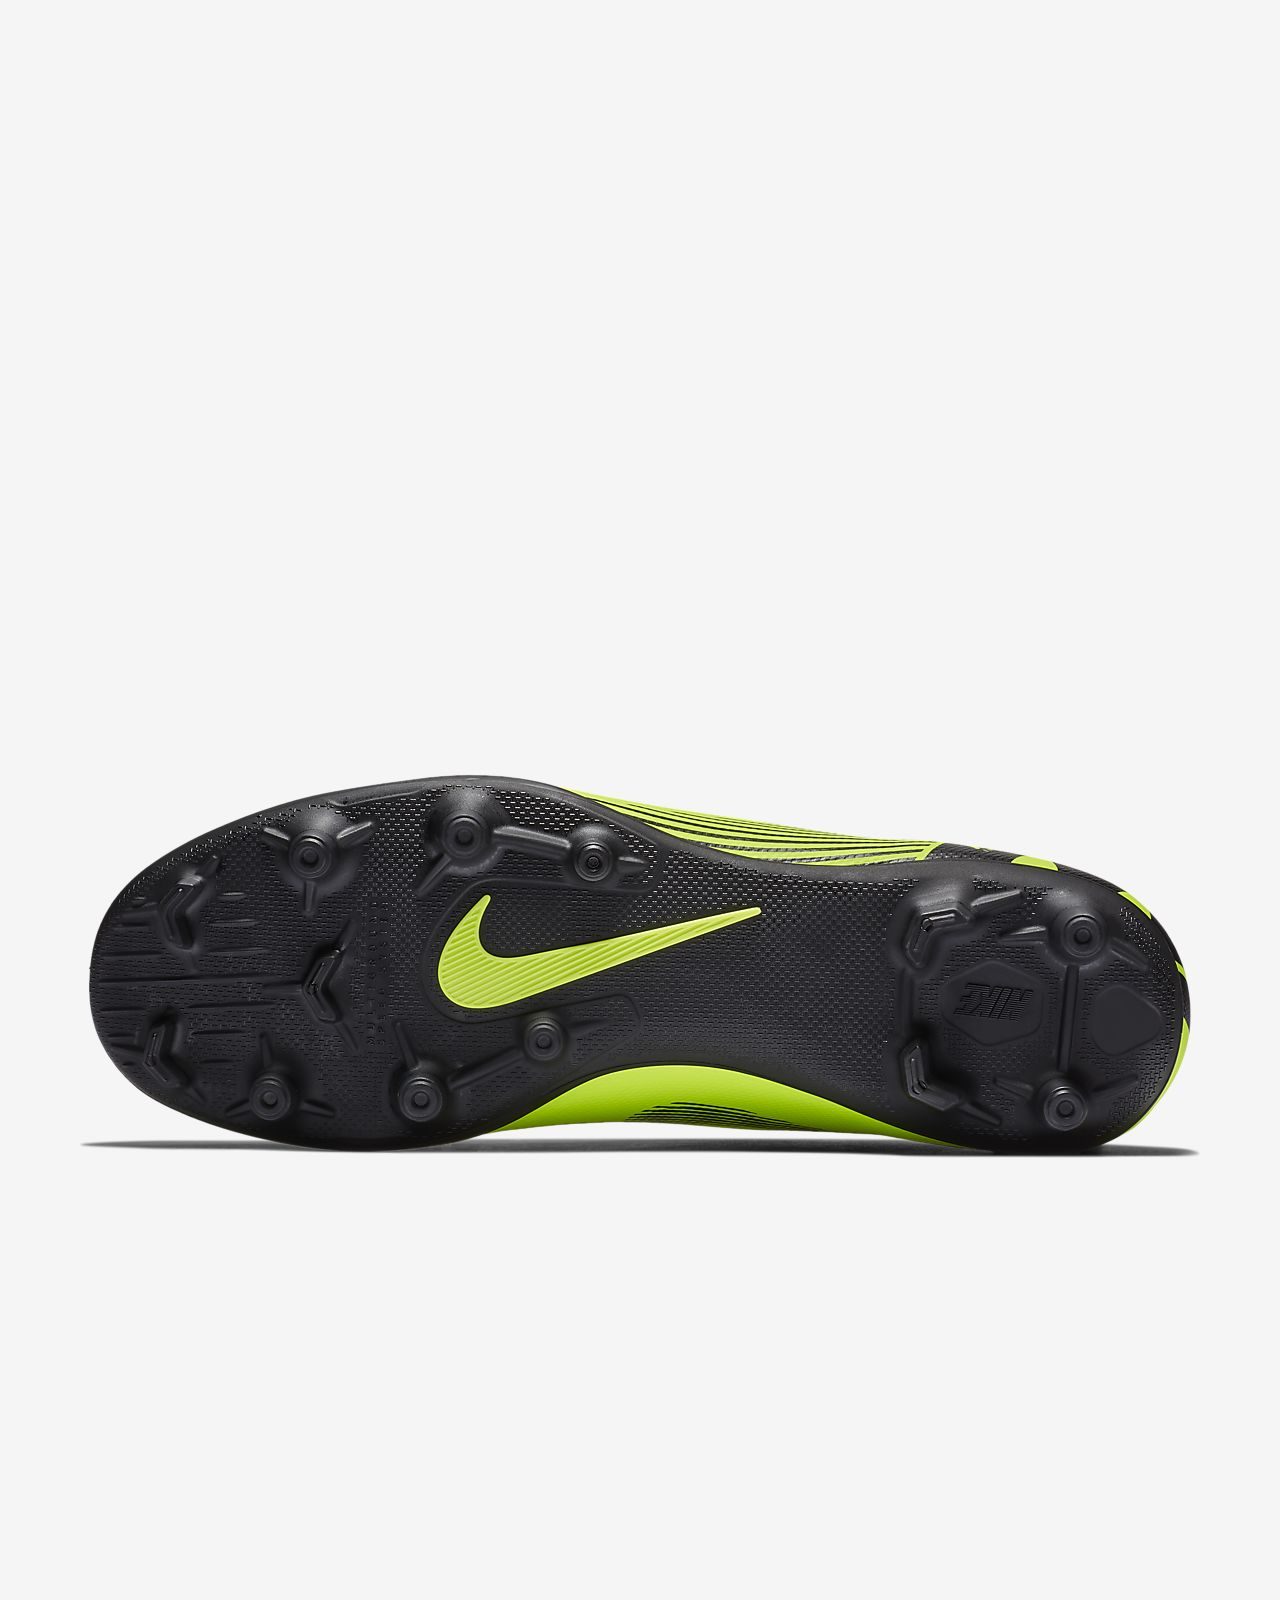 f08f0e220045 Nike Mercurial Vapor XII Club Multi-Ground Soccer Cleat. Nike.com